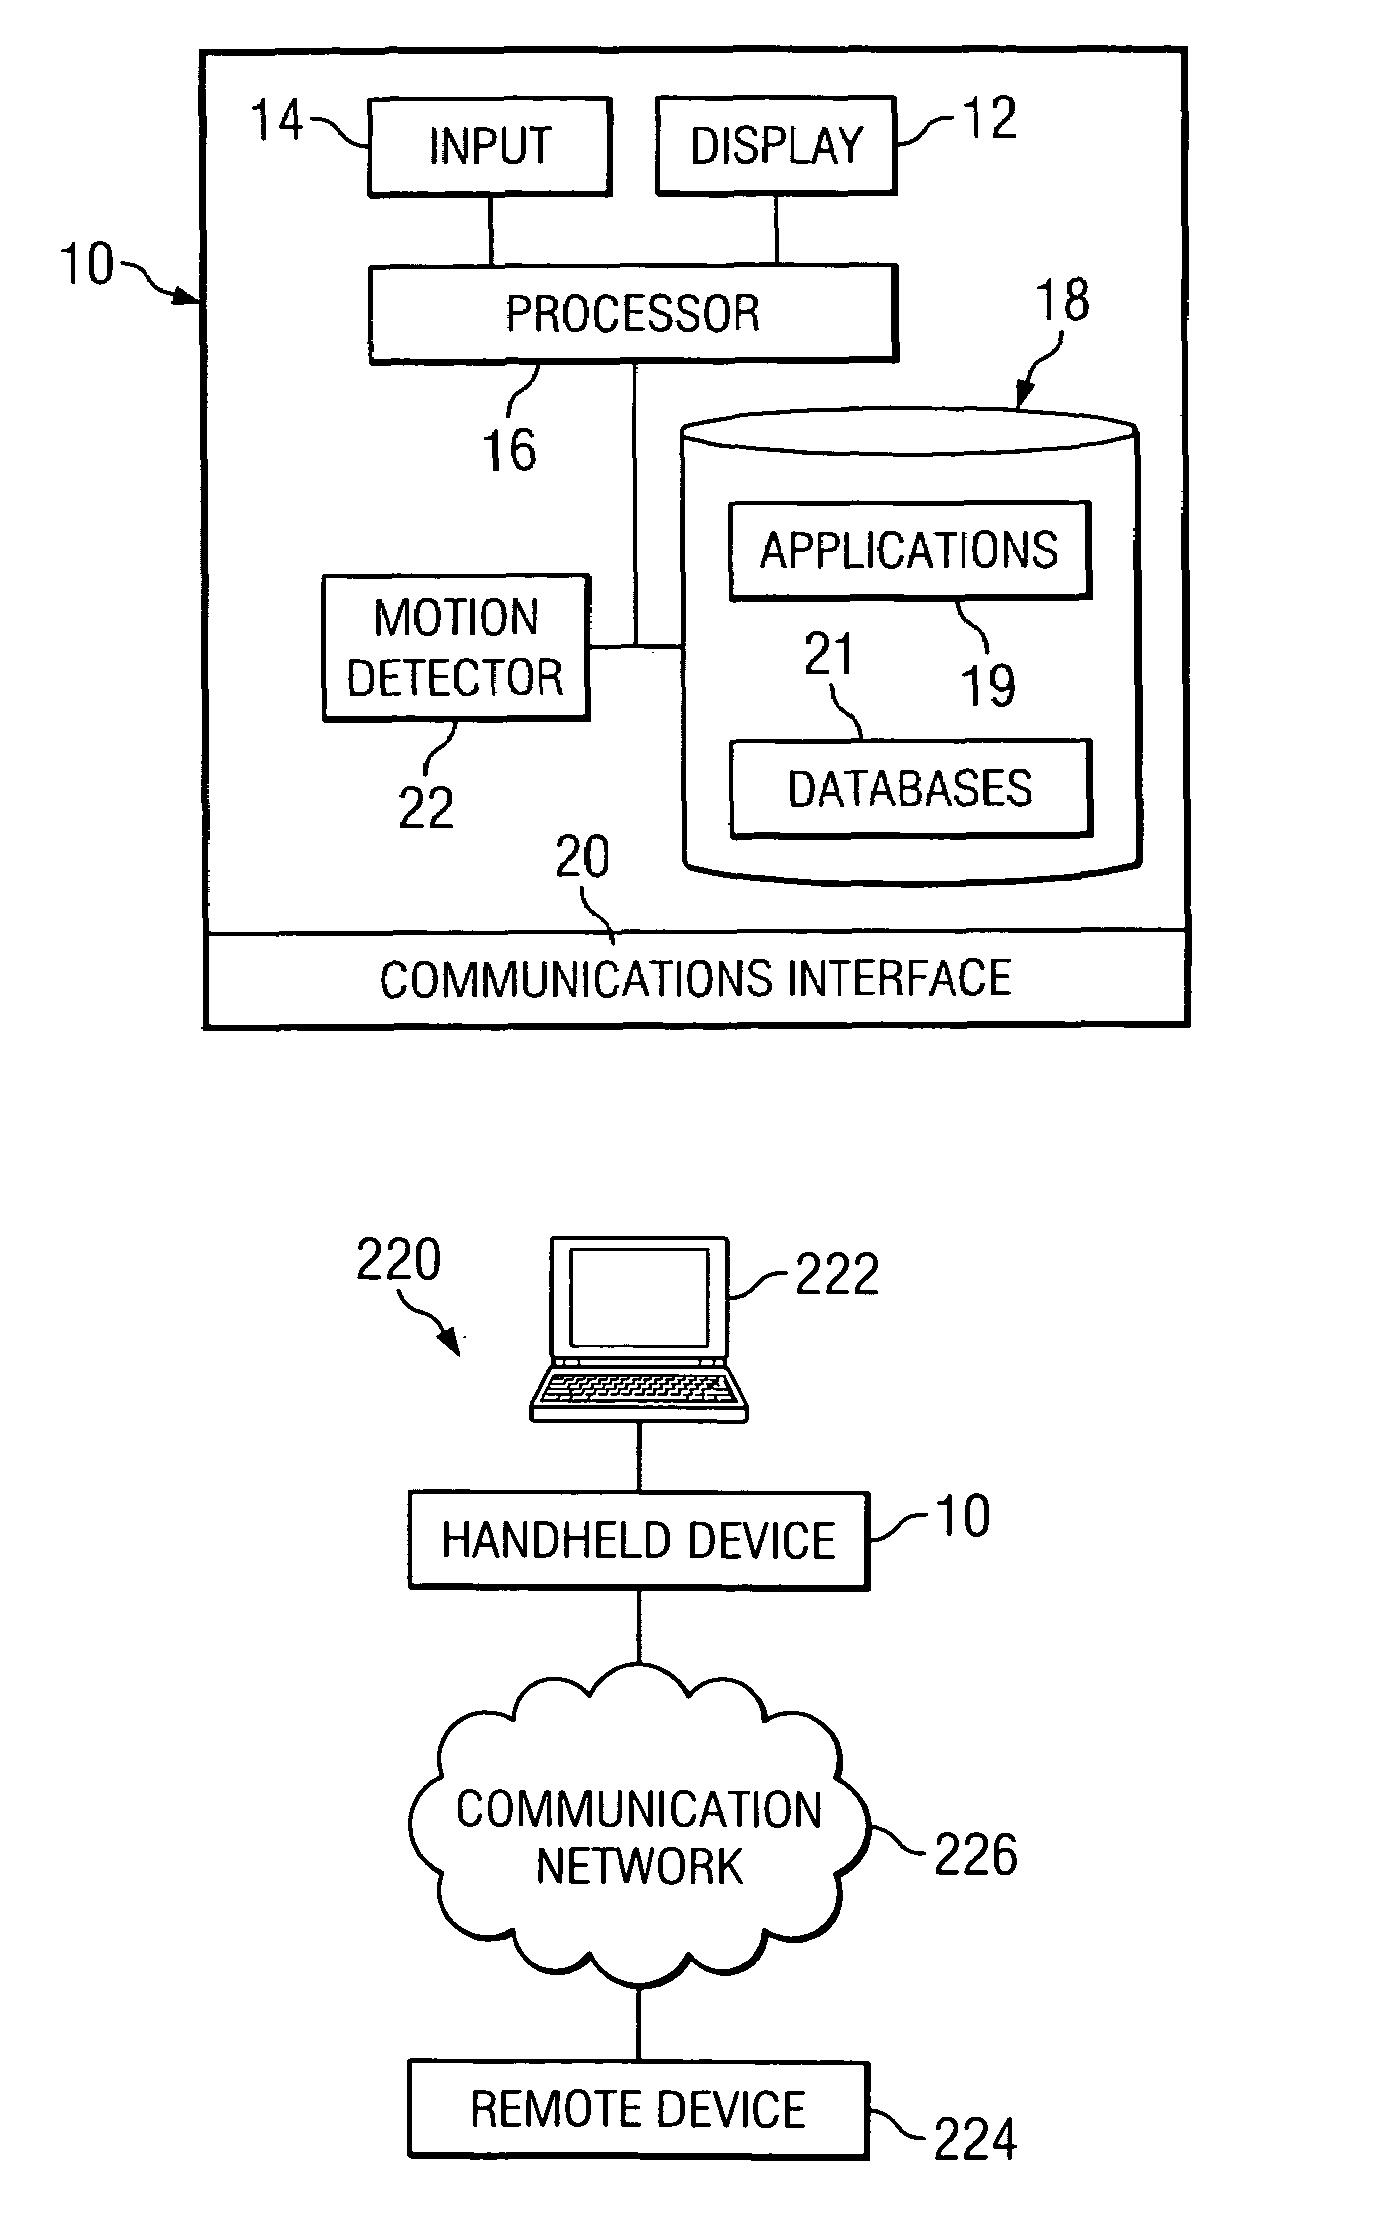 Patent US 7,173,604 B2